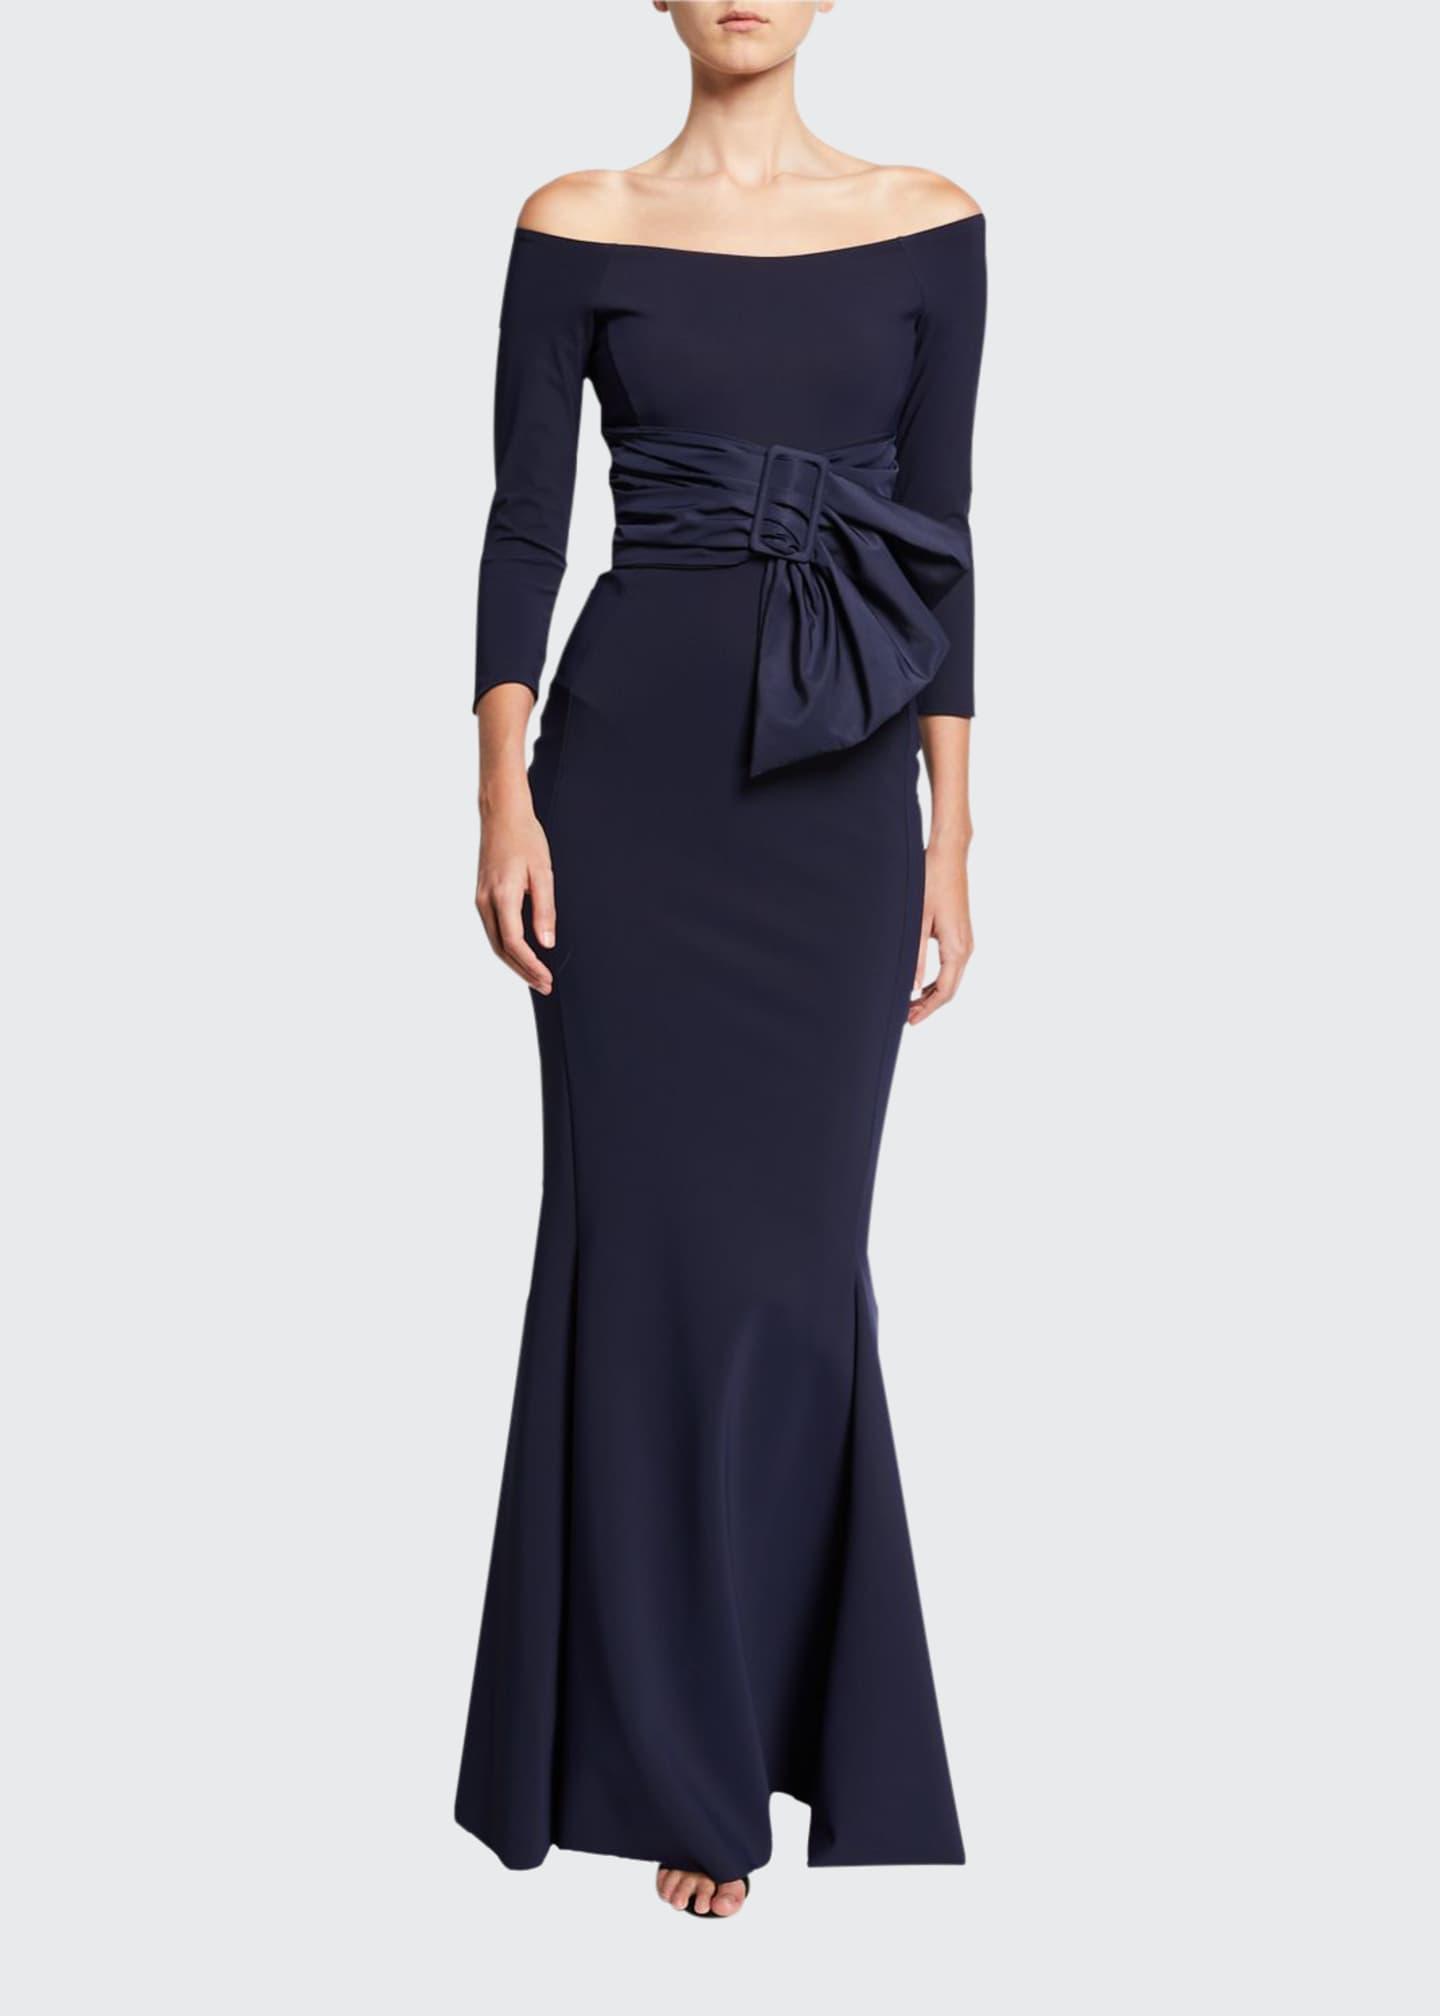 Chiara Boni La Petite Robe Off-Shoulder 3/4-Sleeve Belted